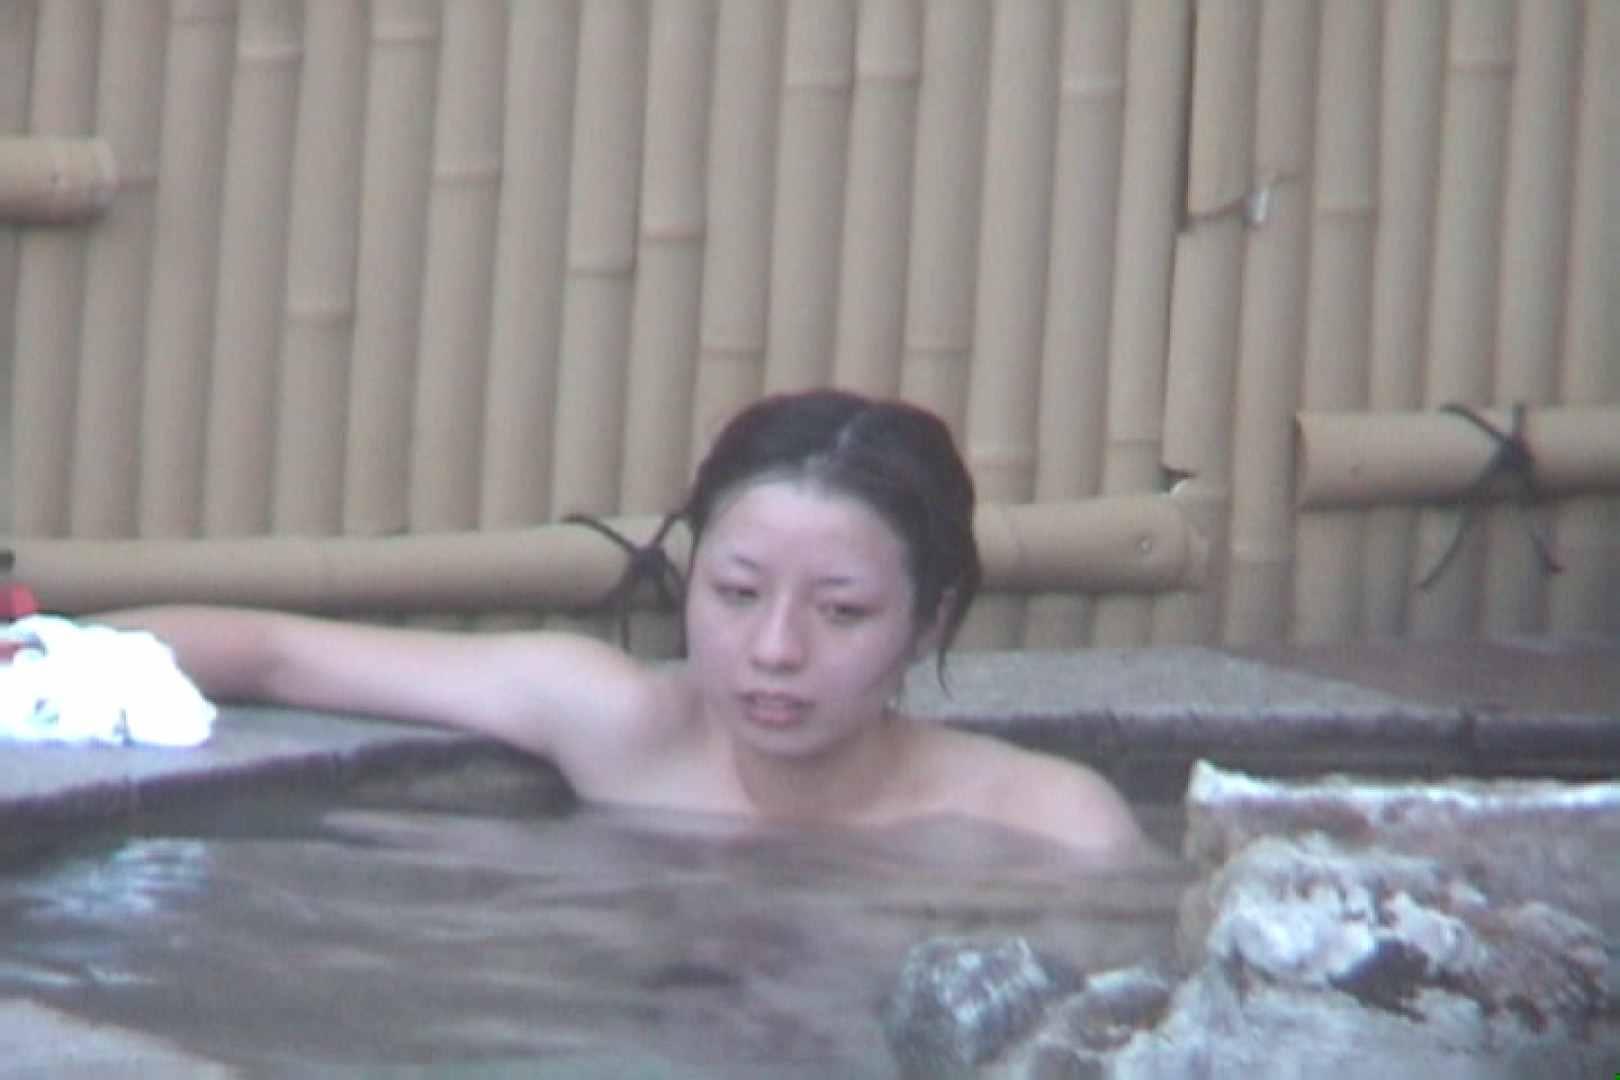 Aquaな露天風呂Vol.608 HなOL | 盗撮  89pic 51